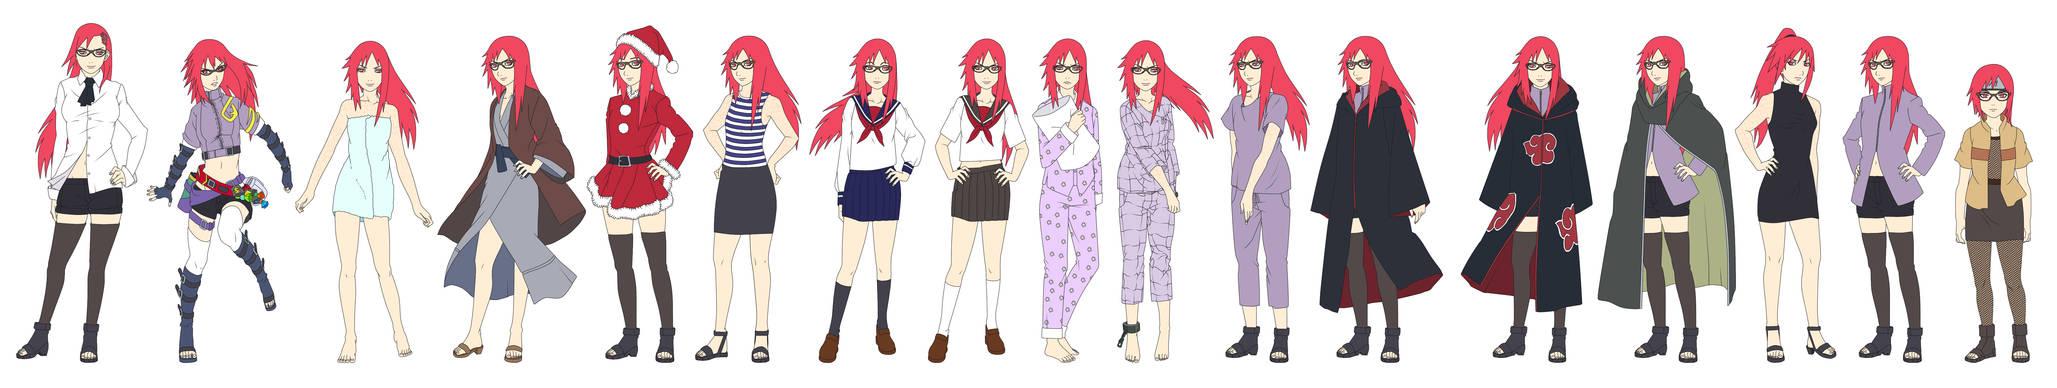 Karin 'Uzumaki' Outfit Color